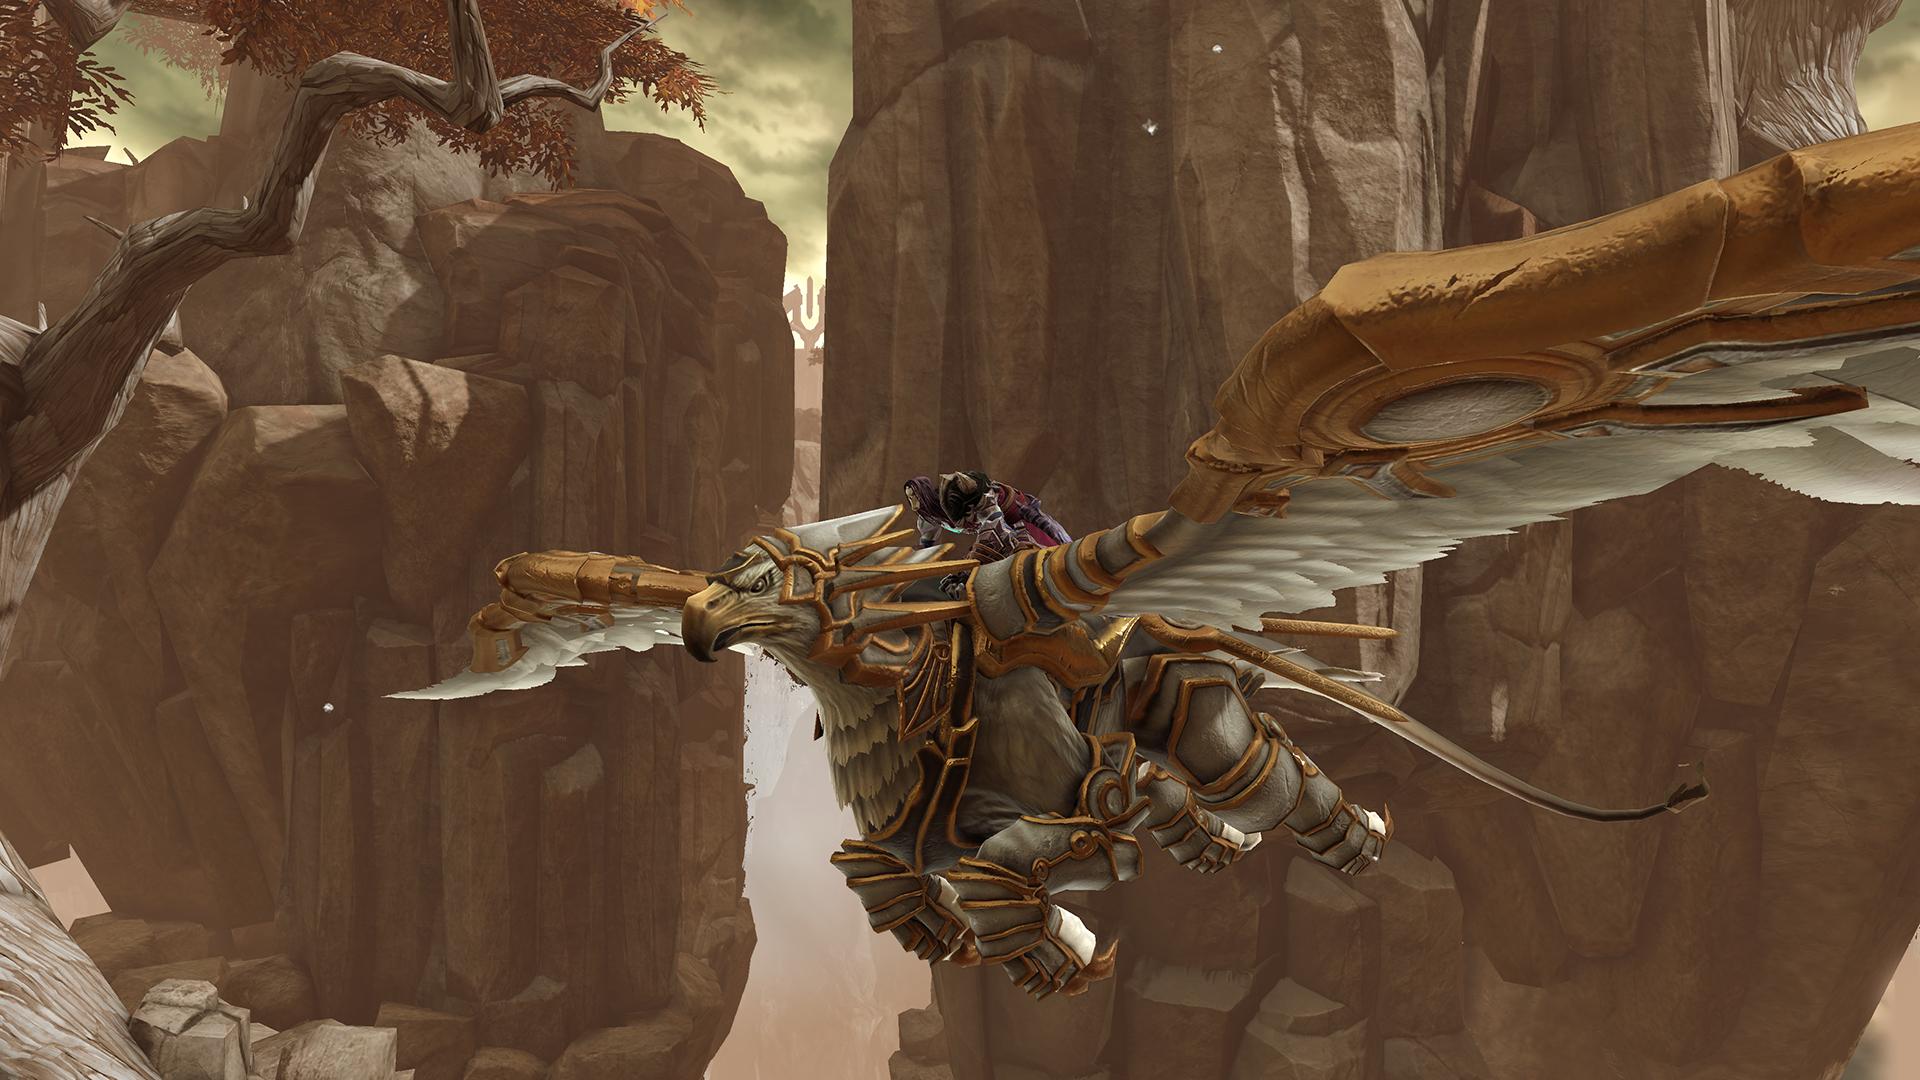 Darksiders II Deathinitive Edition image 2